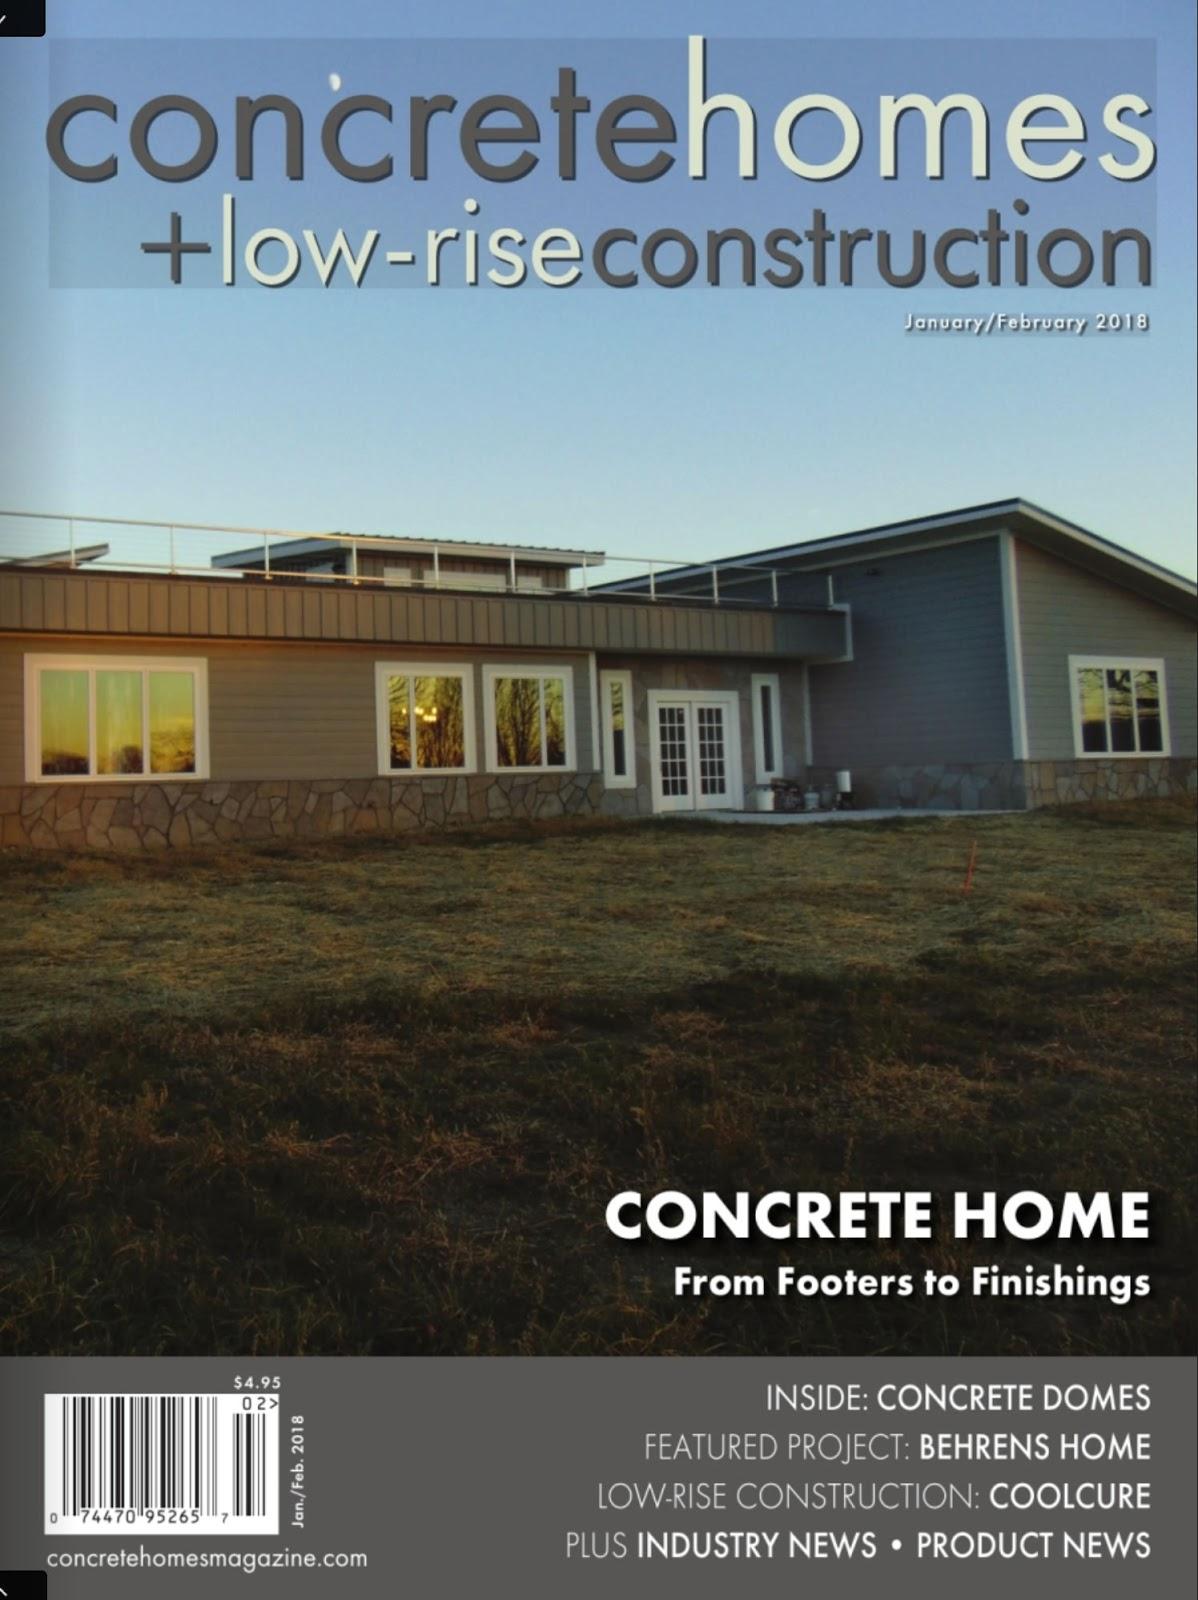 News & Press: Concrete Homes & Low-Rise Construction News